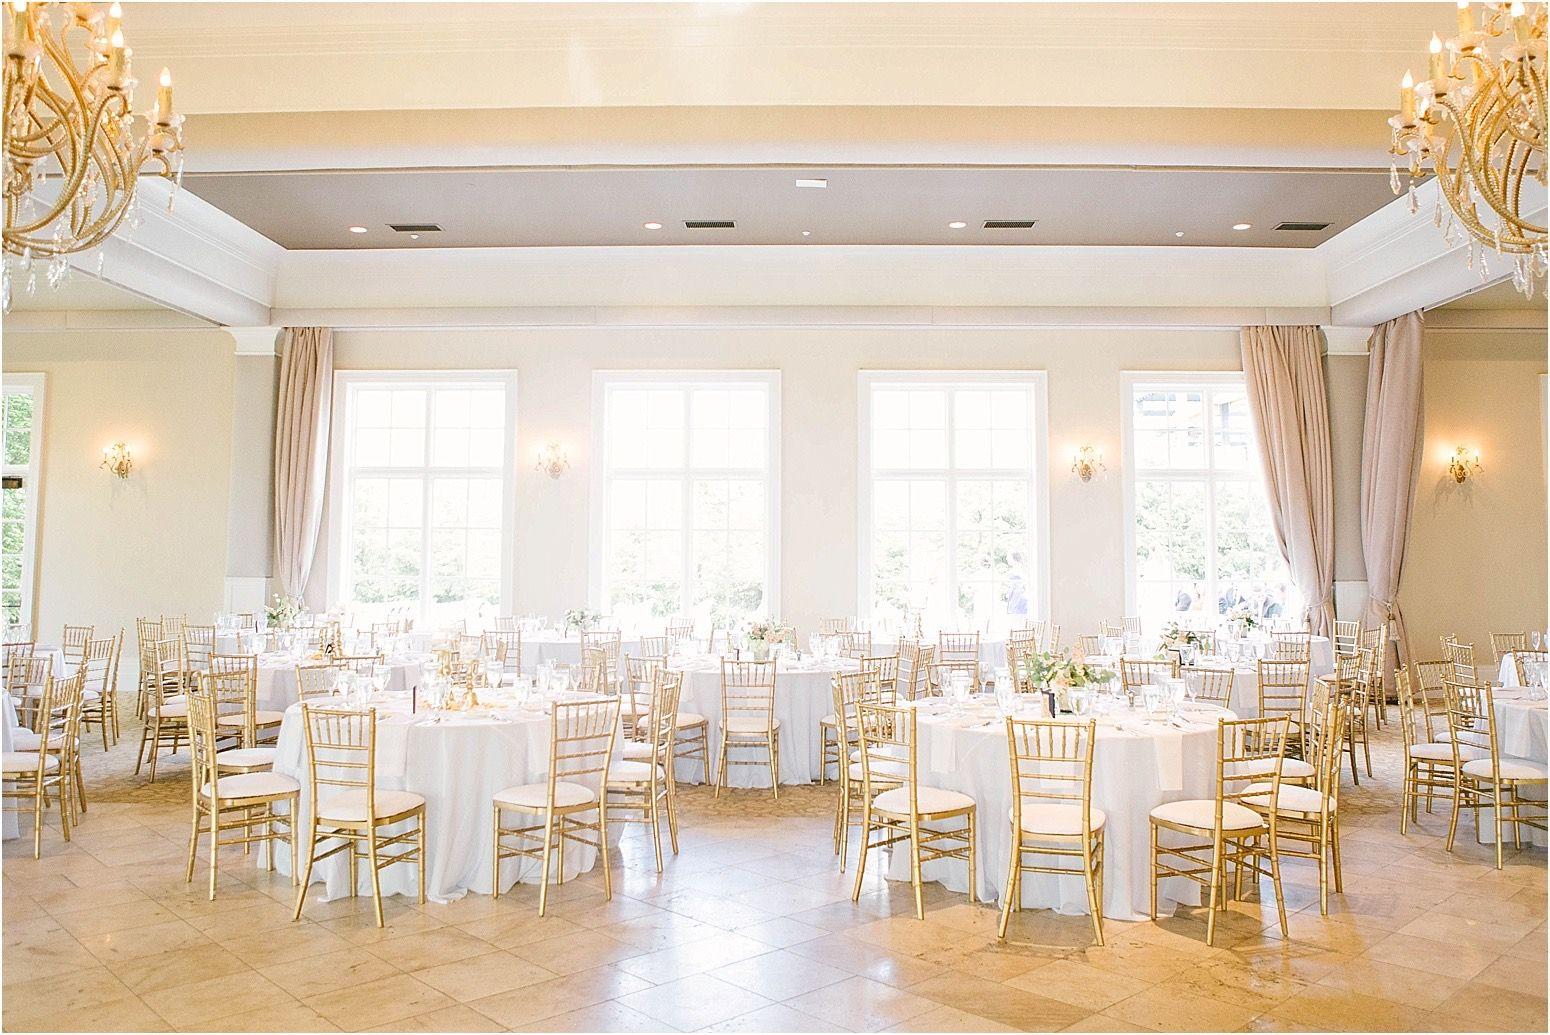 Chairs Golf club wedding, Ohio wedding venues, Columbus